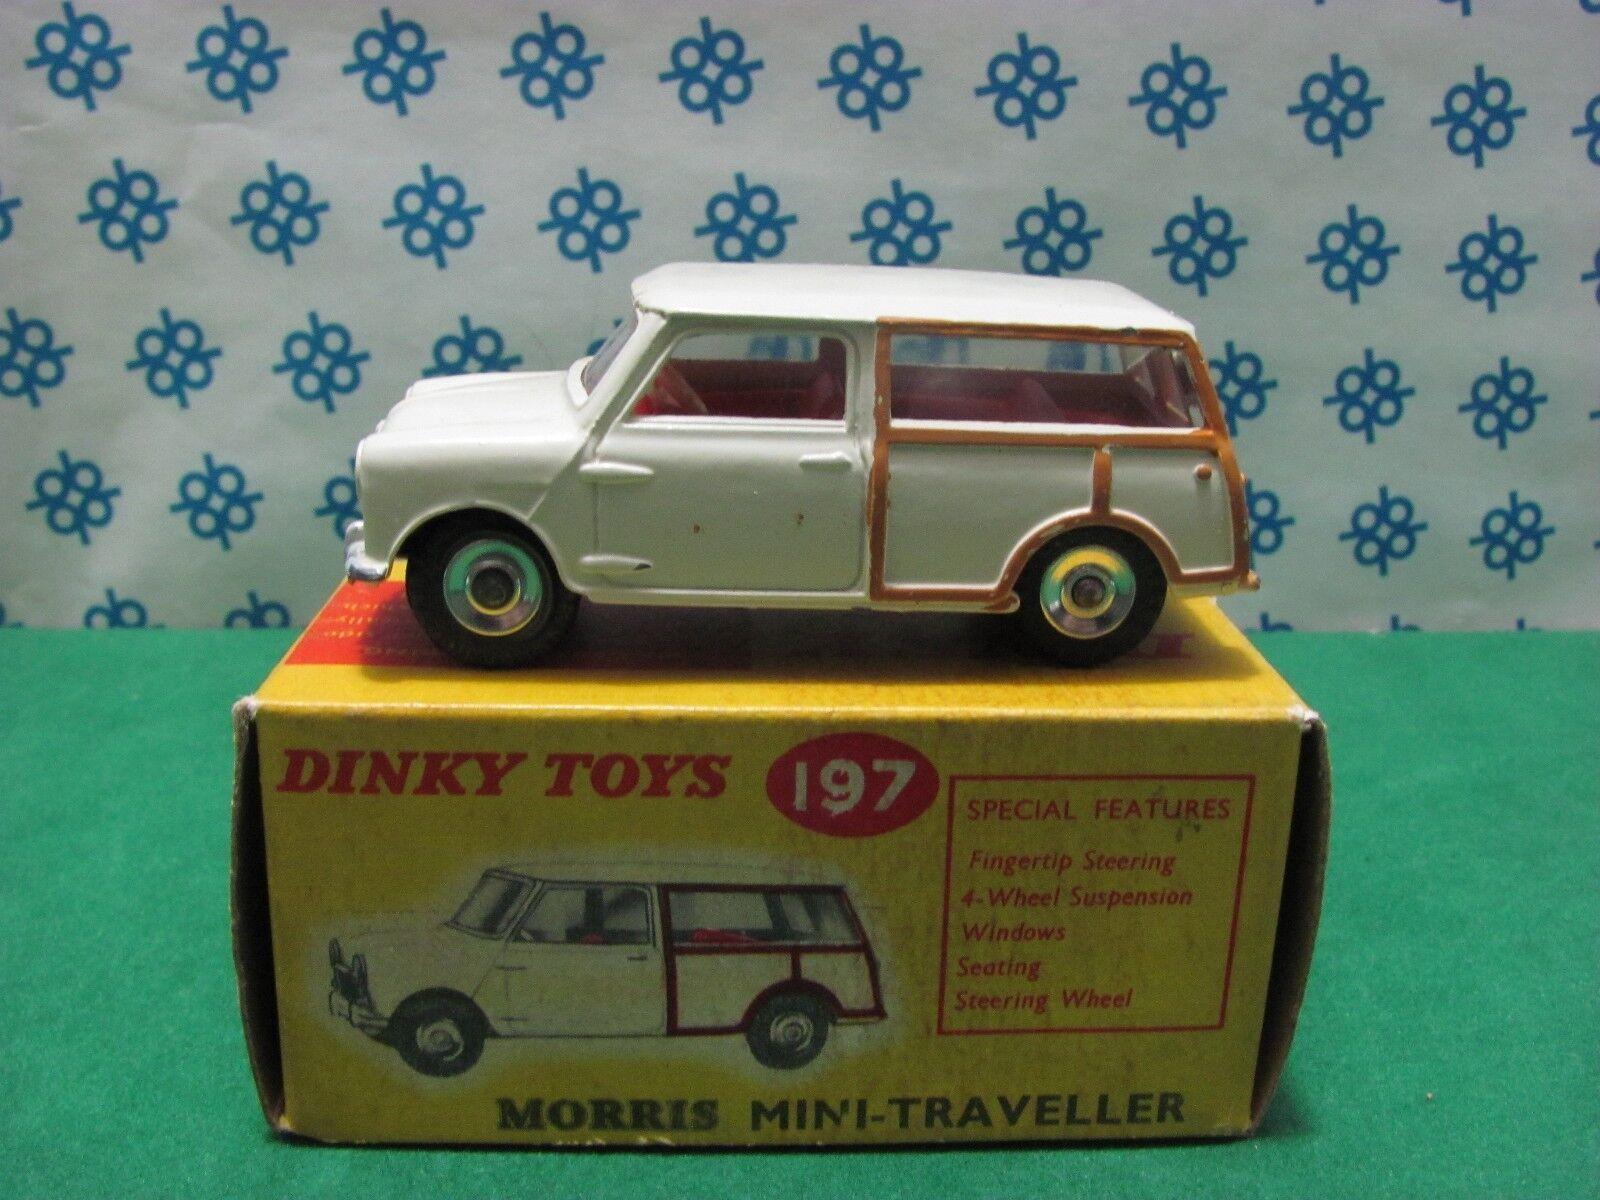 Vintage - Mini Morris Traveller - Dinky Toys 197 New - Mint in Box